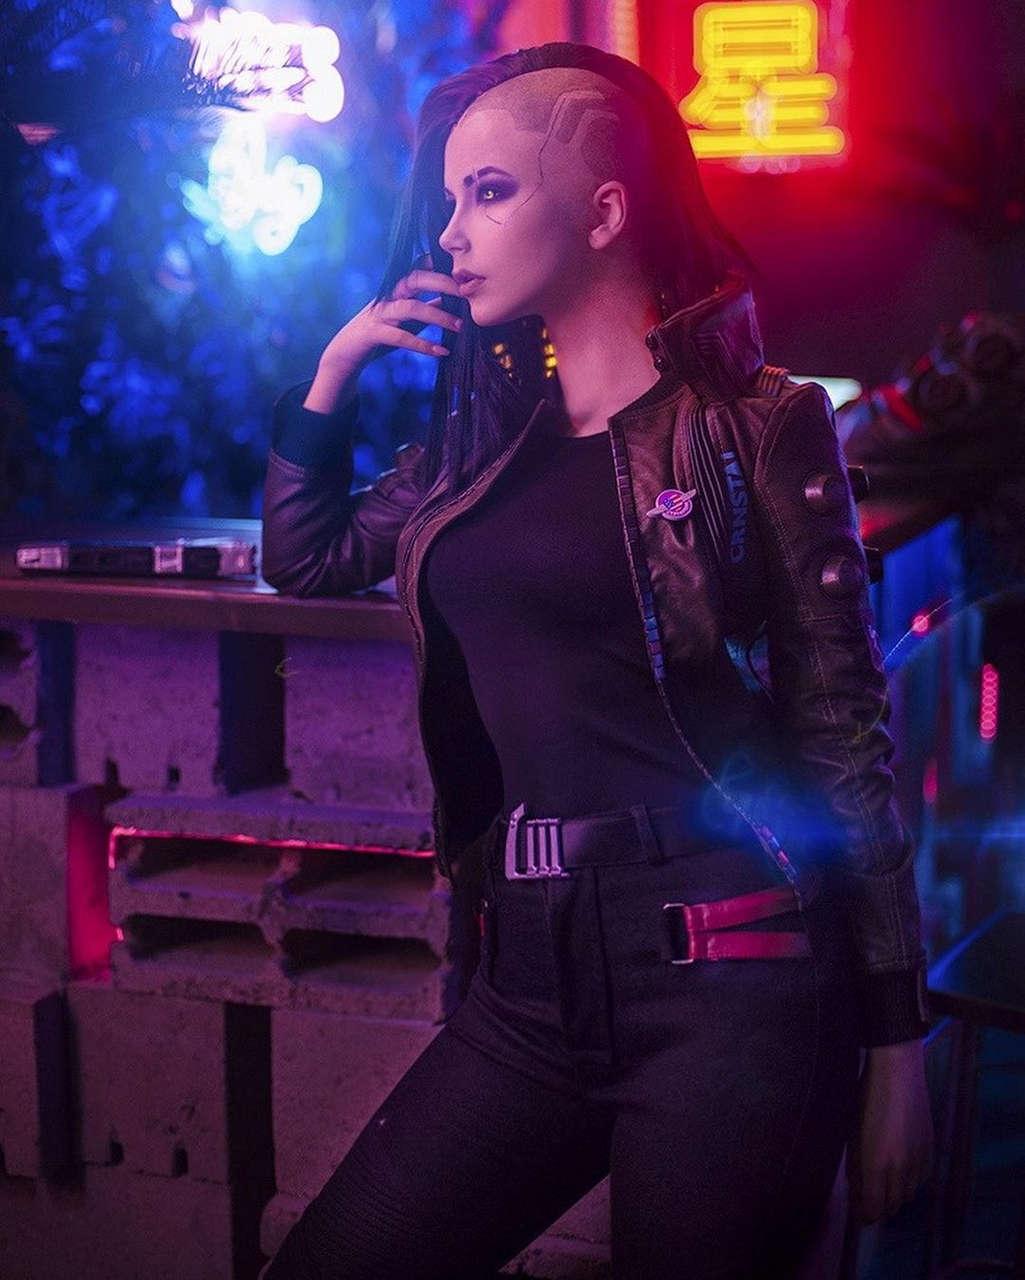 Female V From Cyberpunk By Oichi - cosplaygirls.net